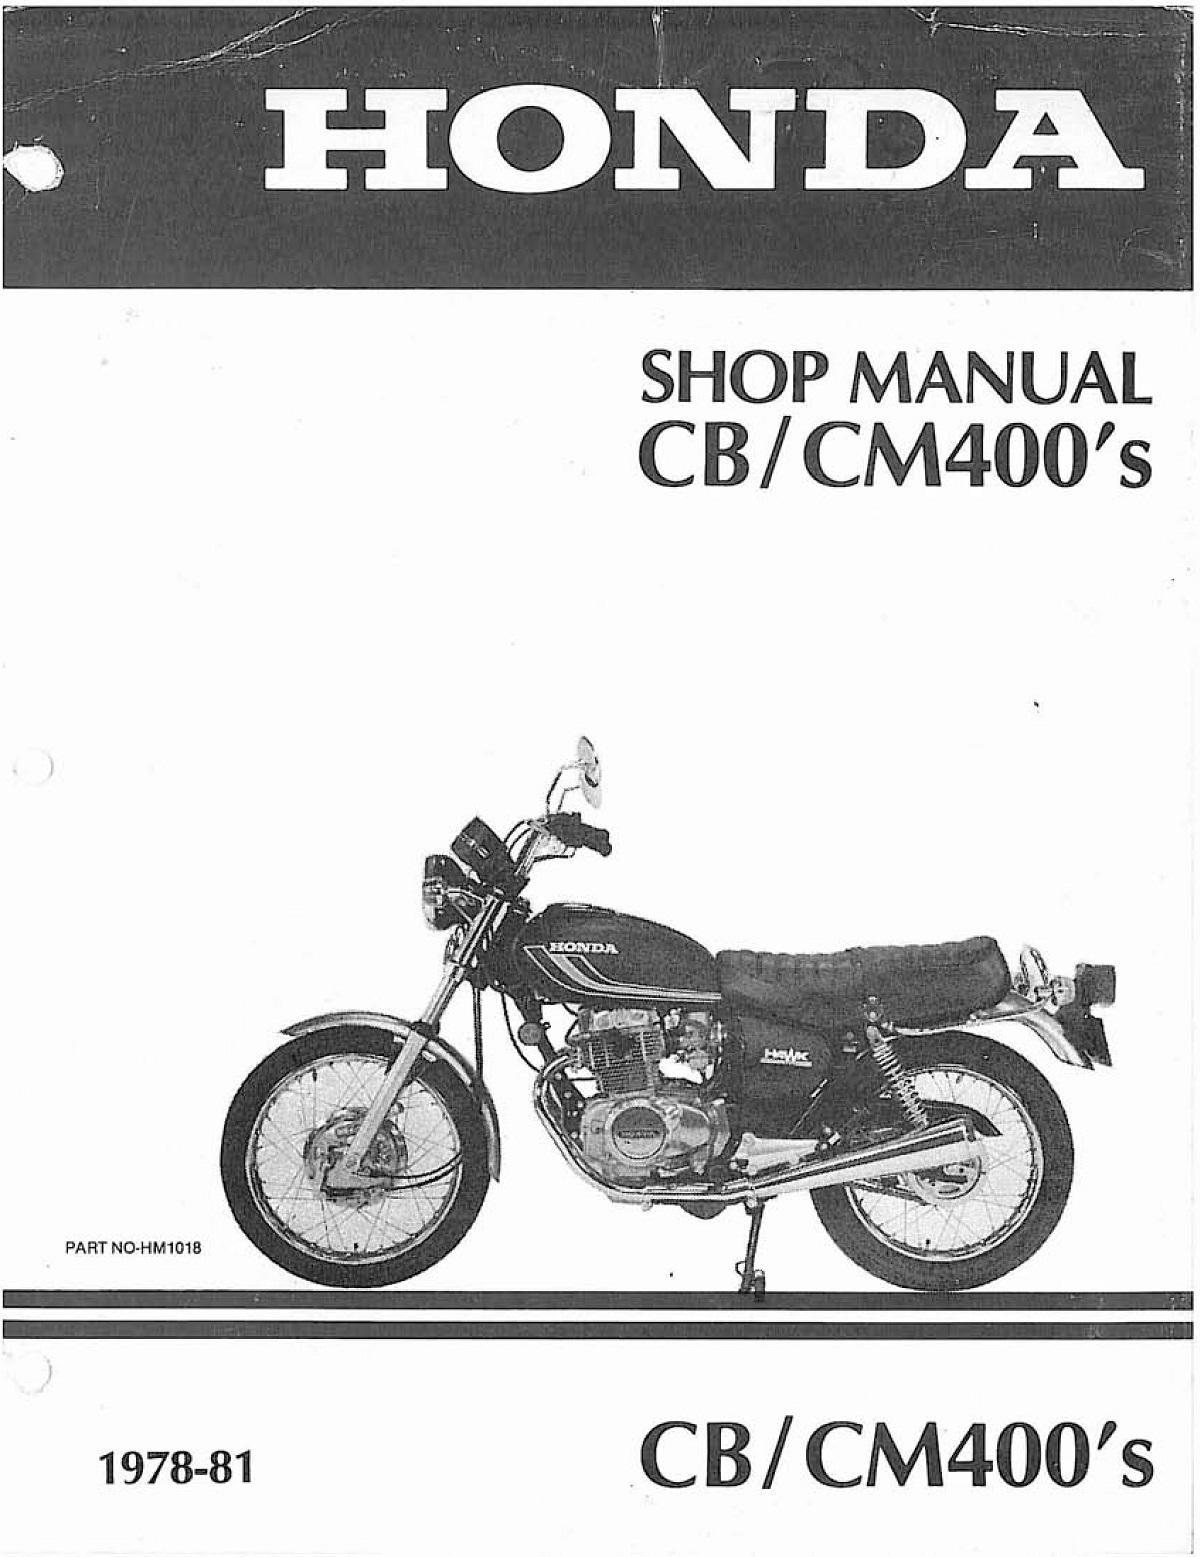 Workshop Manual for Honda CB400 (1978-1981)